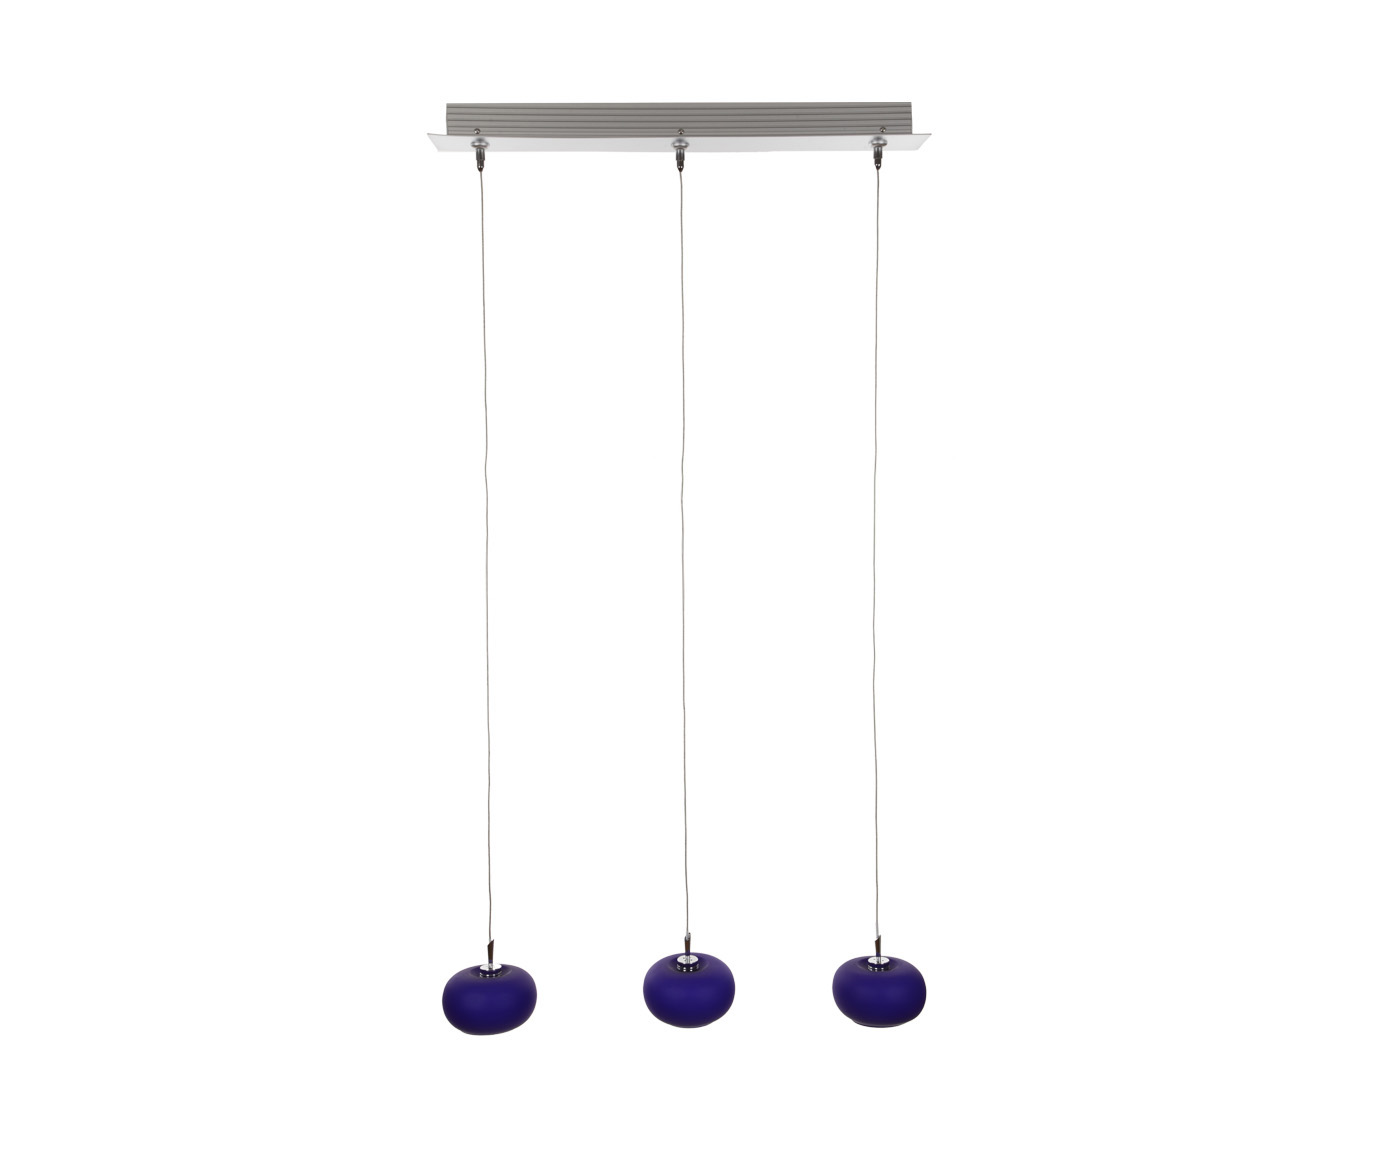 цена {} CRYSTAL LIGHT Светильник потолочный Lilyum Цвет: Синий (10х63х180 см) онлайн в 2017 году